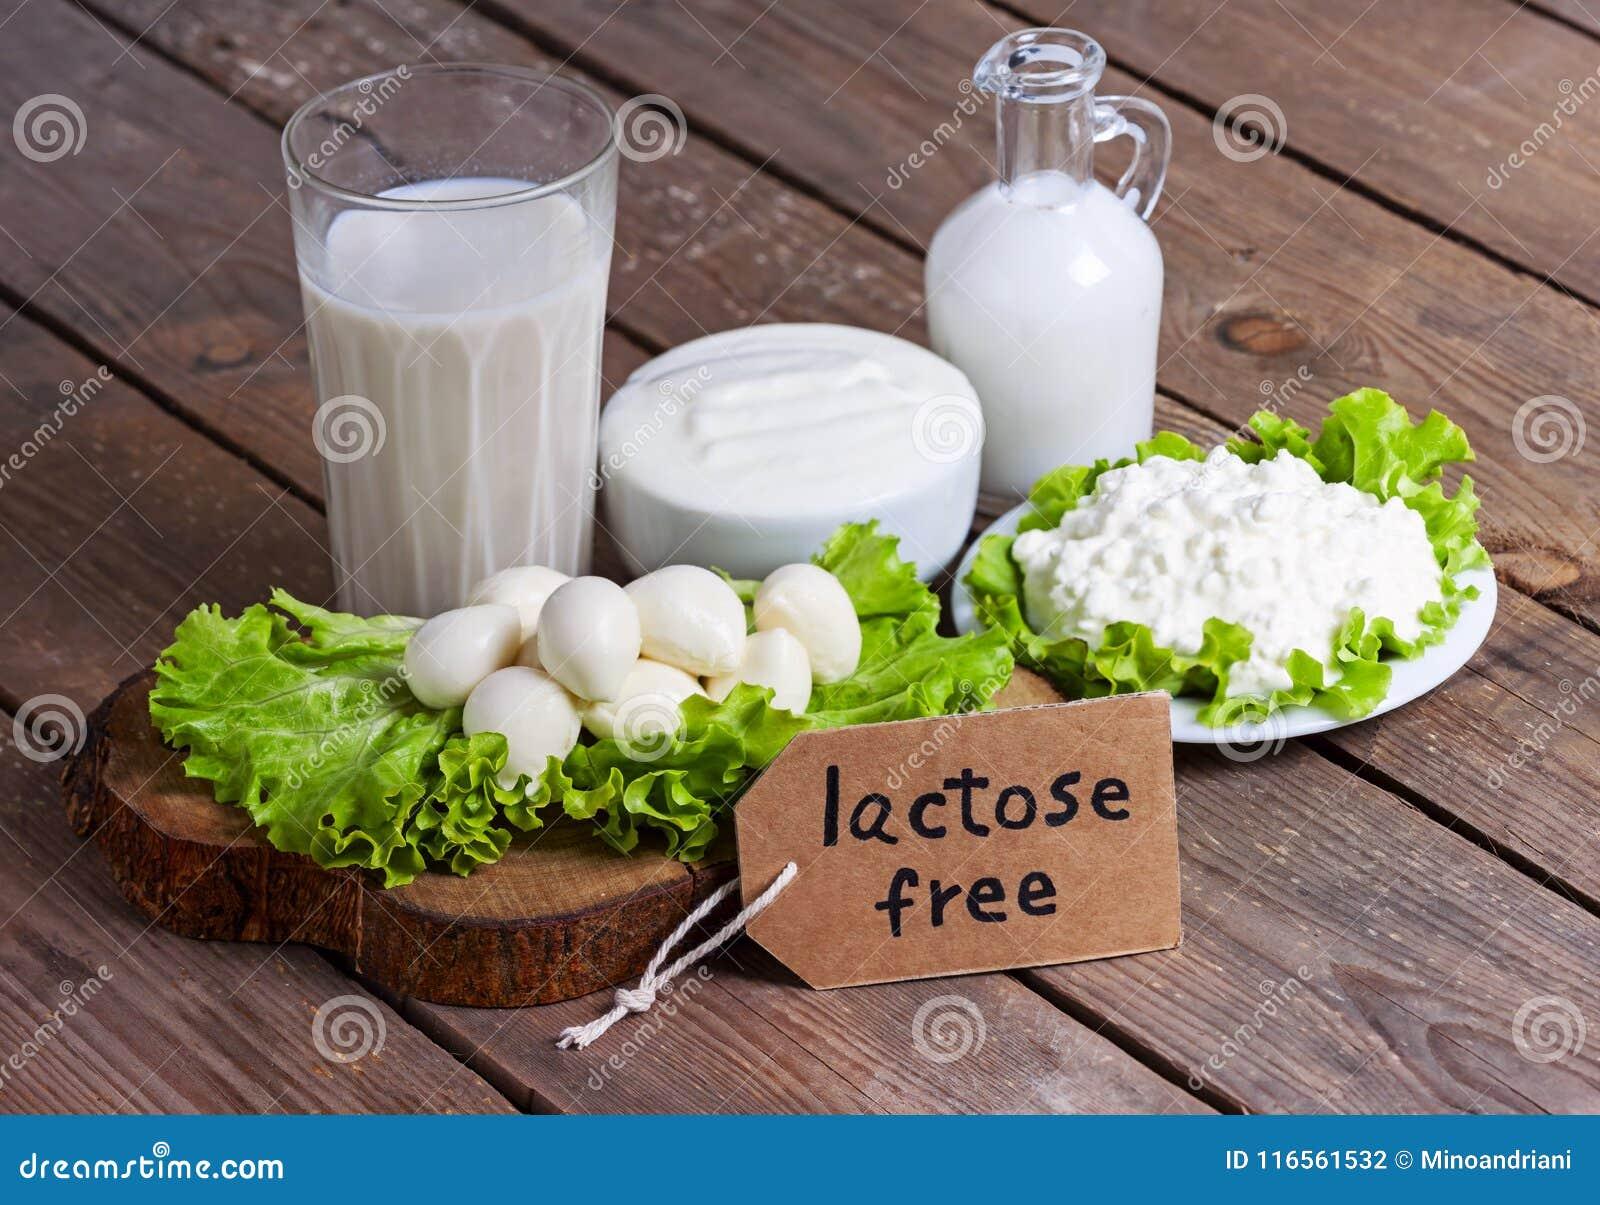 Milk, Yogurt And Cheese With Background Stock Photo - Image of